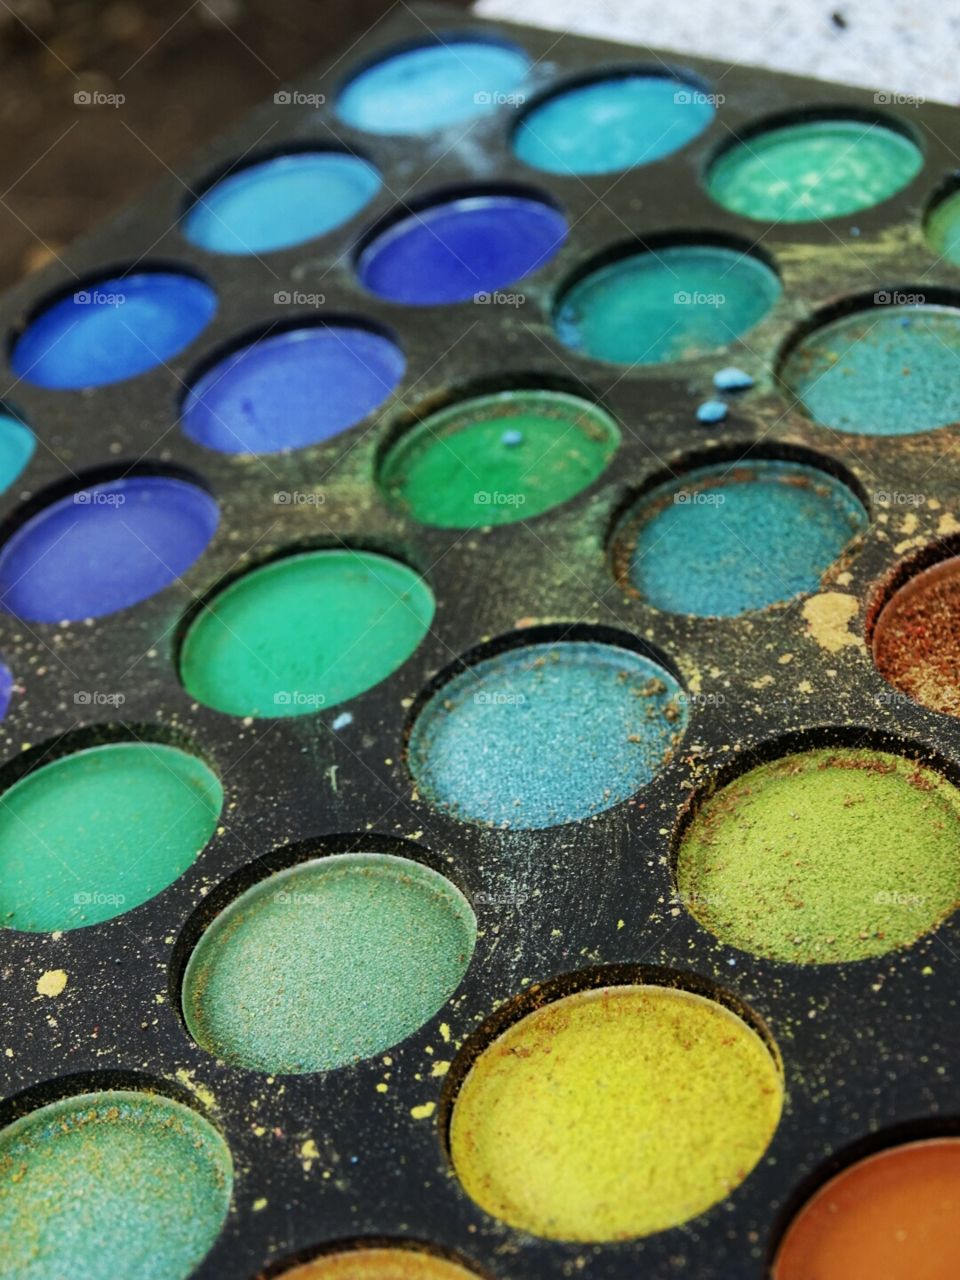 Multicolored eye makeup palette